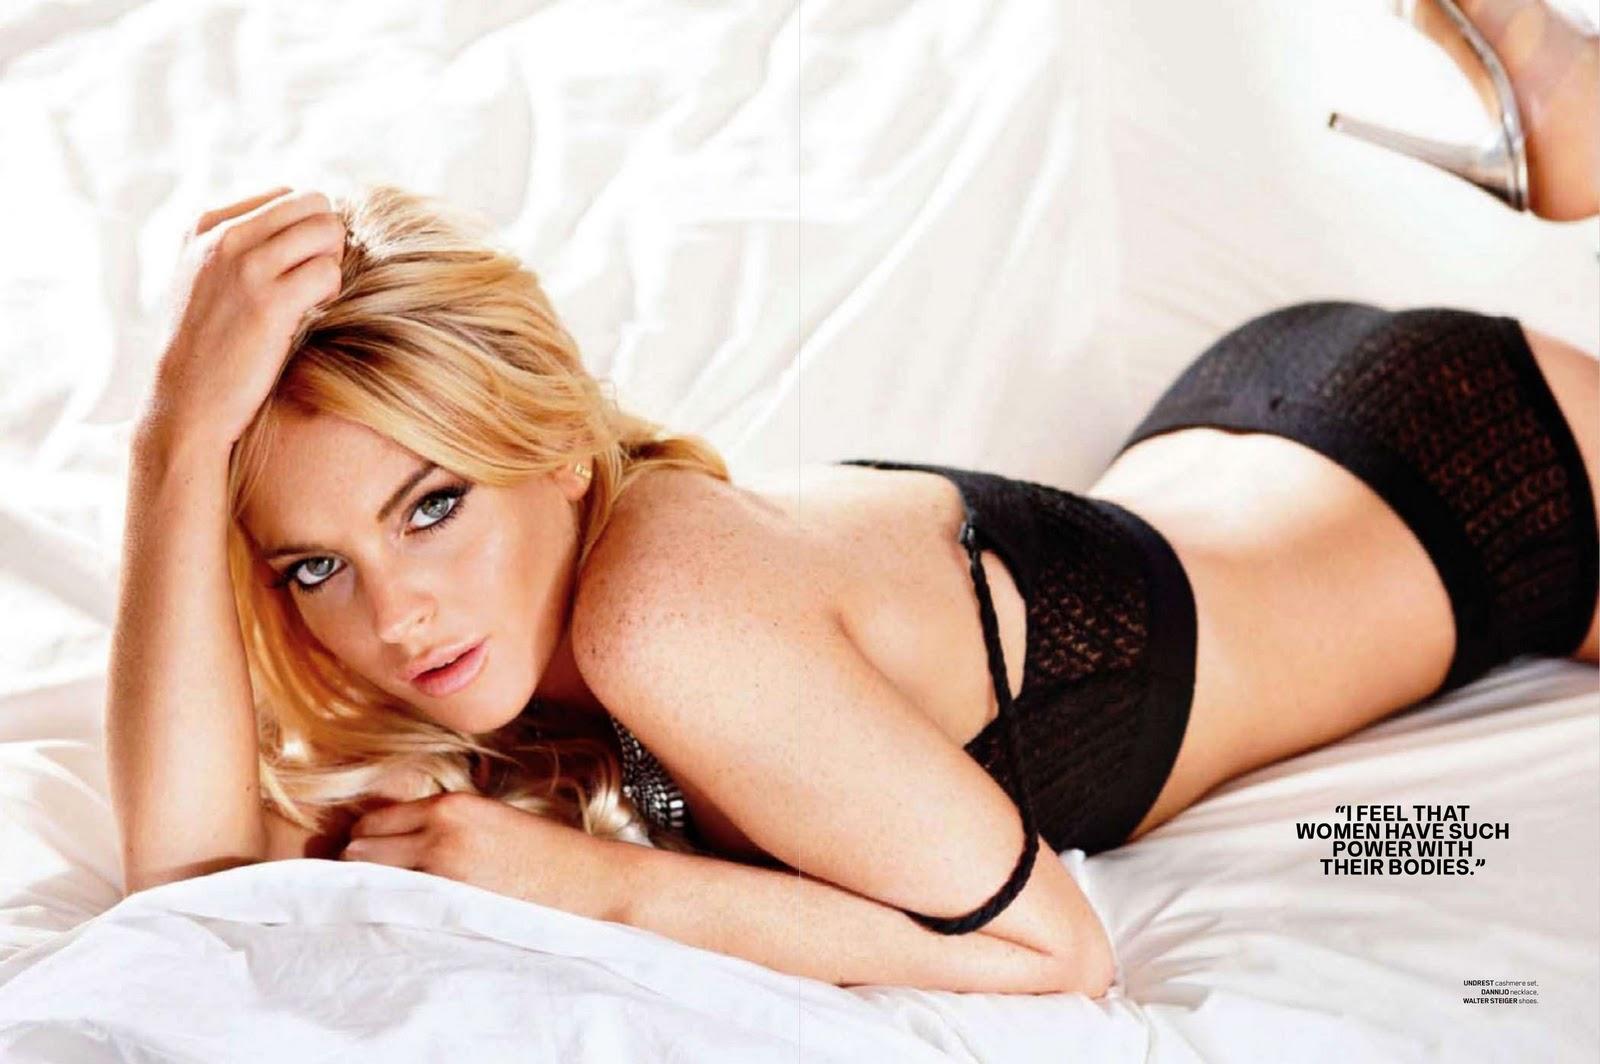 http://1.bp.blogspot.com/_QcYf_8sBCik/TTU8QBcjo6I/AAAAAAAAIE4/s5FCCmCza2o/s1600/Lindsay+Lohan+%25E2%2580%2593+Maxim+Magazine+%25284%2529.jpg